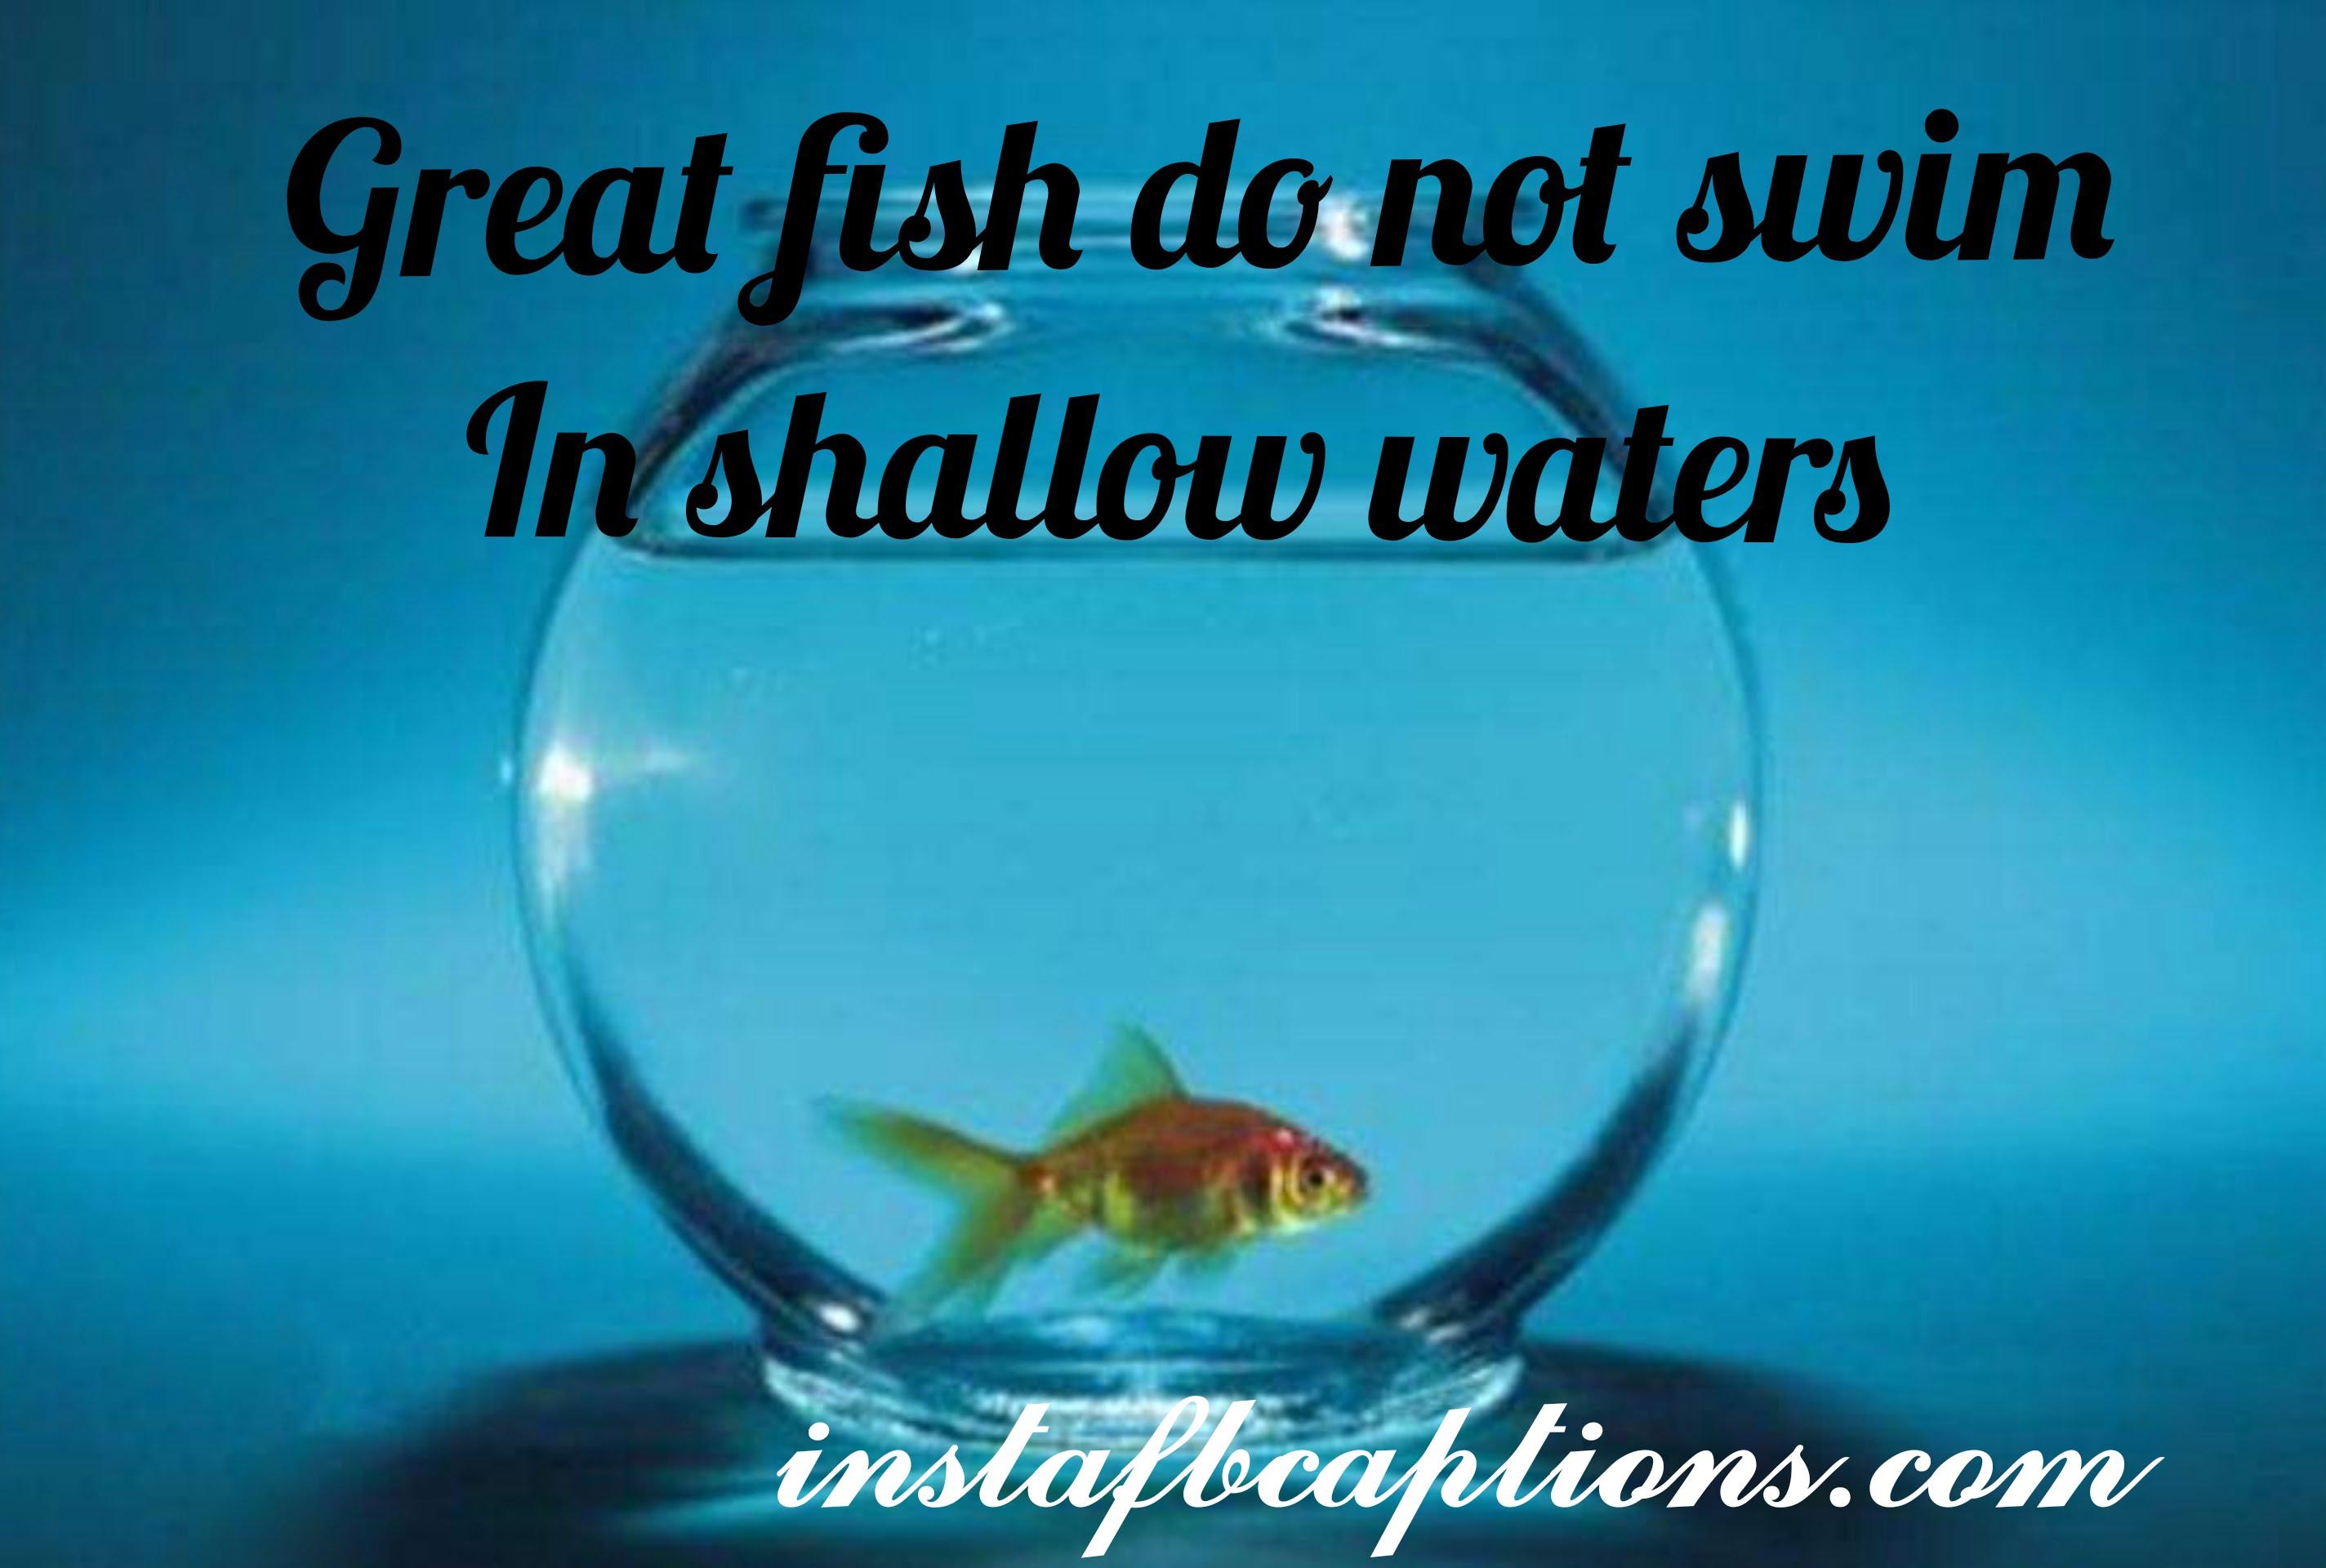 Good Fish Donot Swim In Swallow Water  - good fish donot swim in swallow water - Aquarium captions for Pet Fish||(cute planted nature)